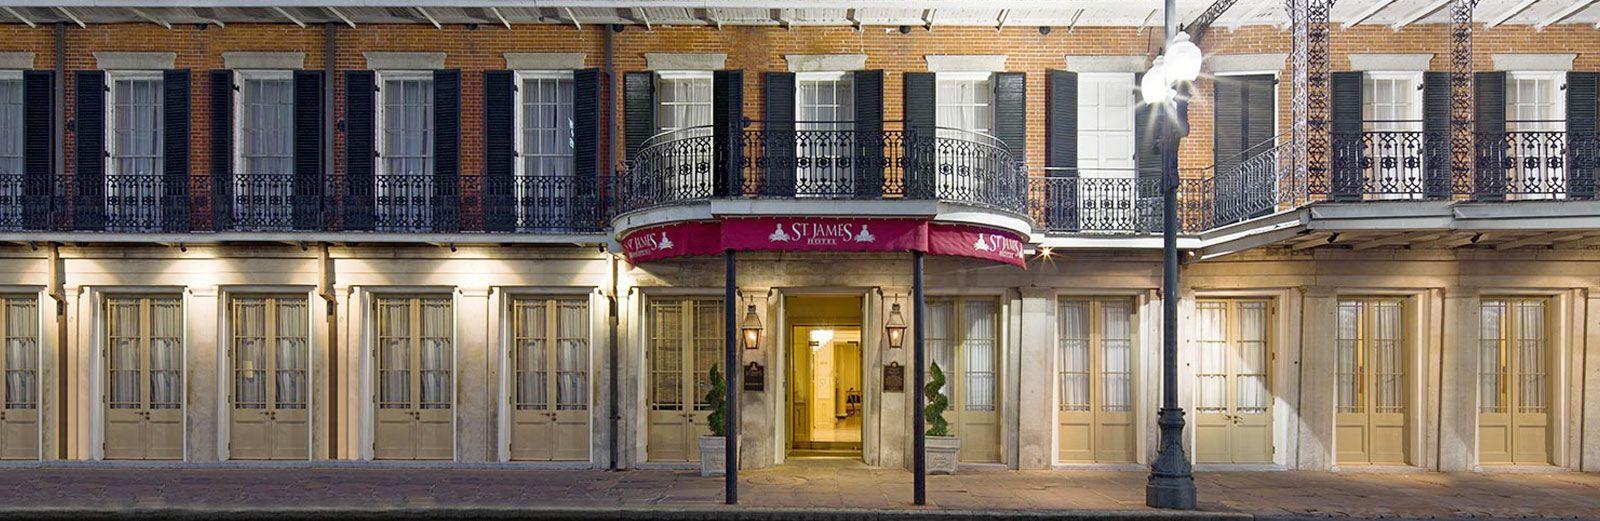 new orleans hotel st james hotel cbd in the french quarter nola rh pinterest com